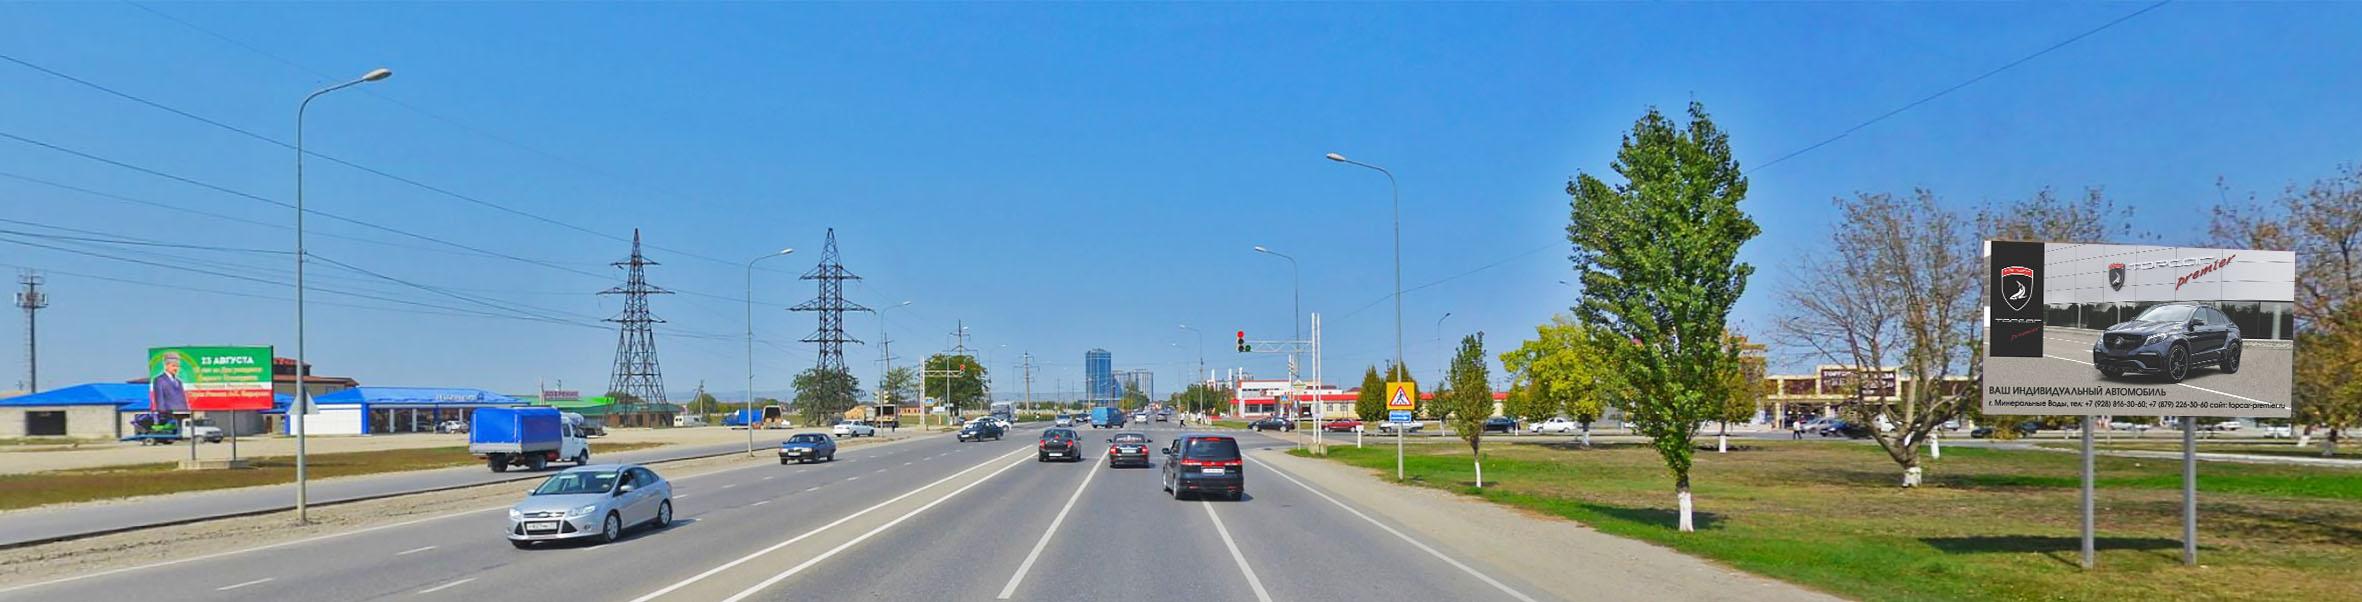 Реклама на билбордах в Аргуне Чечня